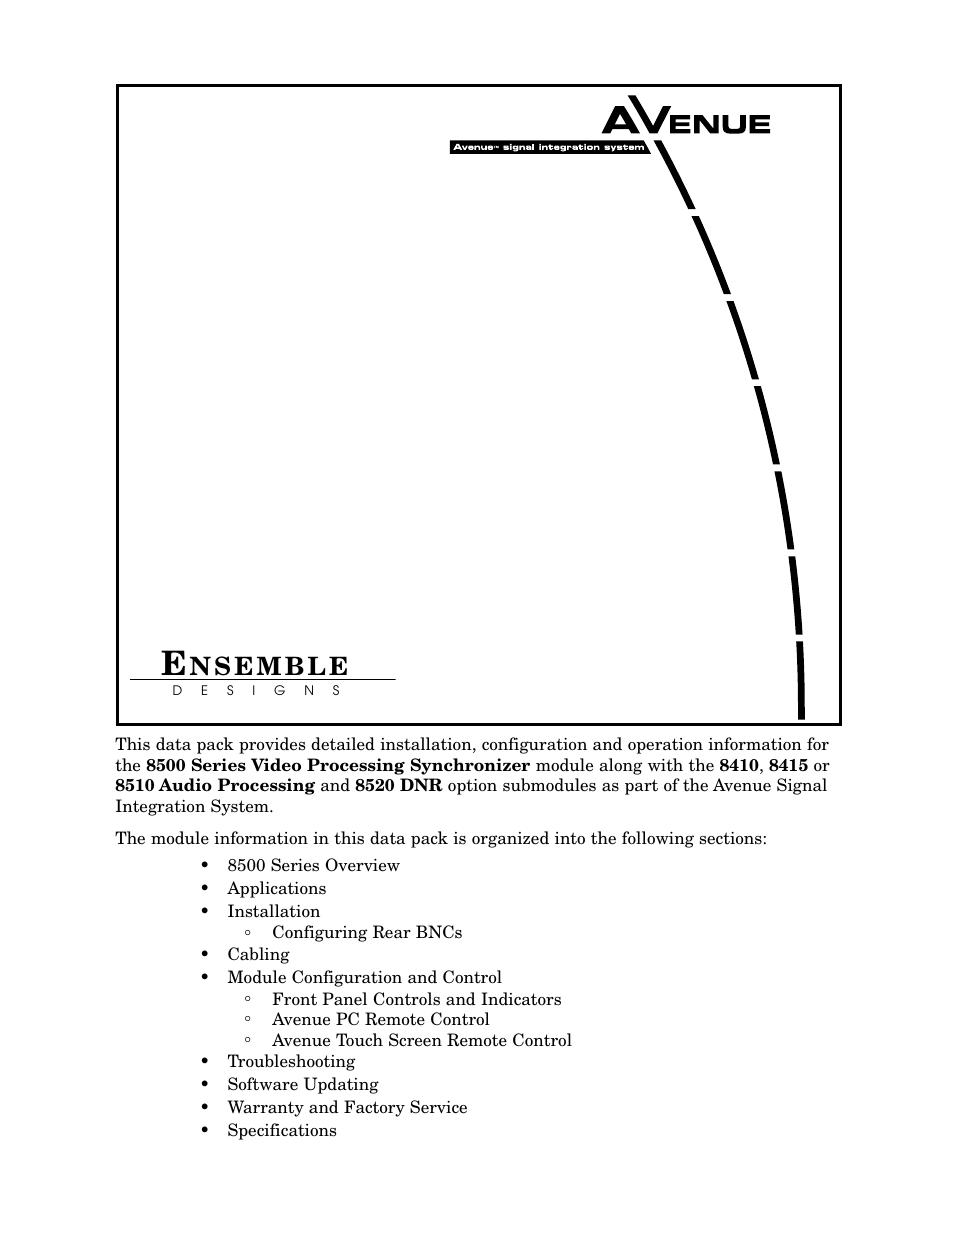 Ensemble Designs 8500 Composite / SD Legalizer and Video Processing ...